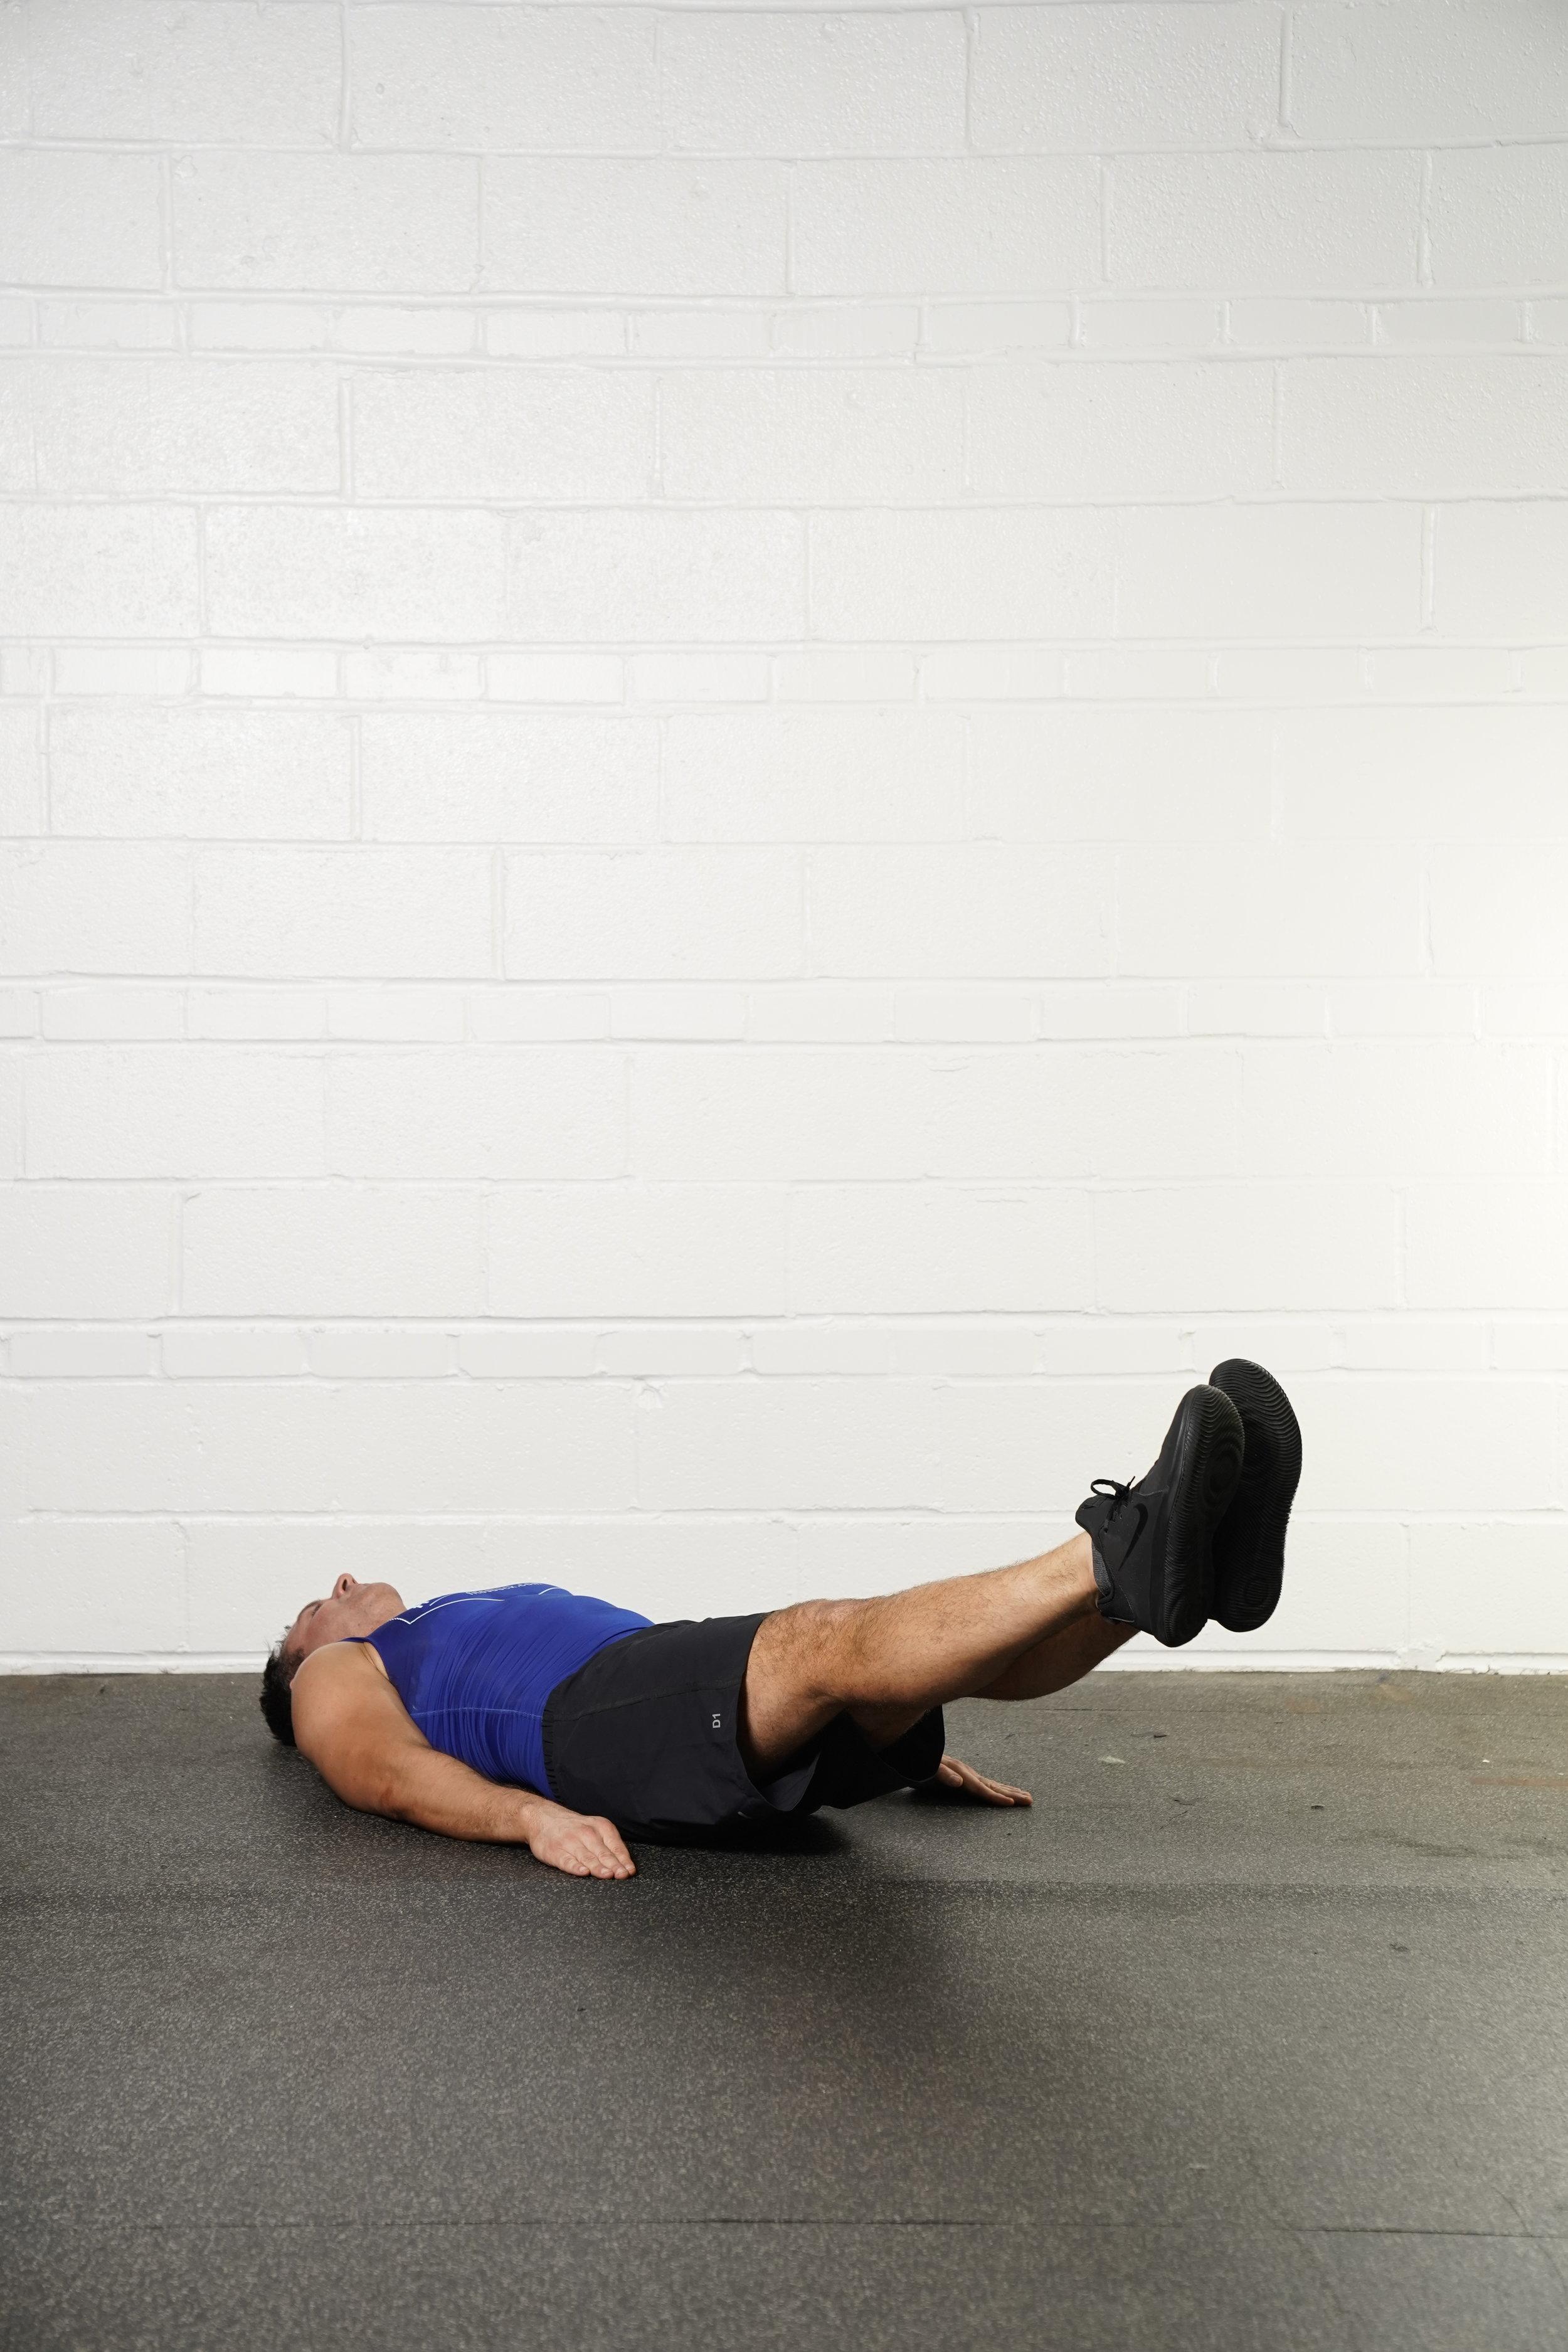 Leg Raise Hold - - DURATION: 30 seconds